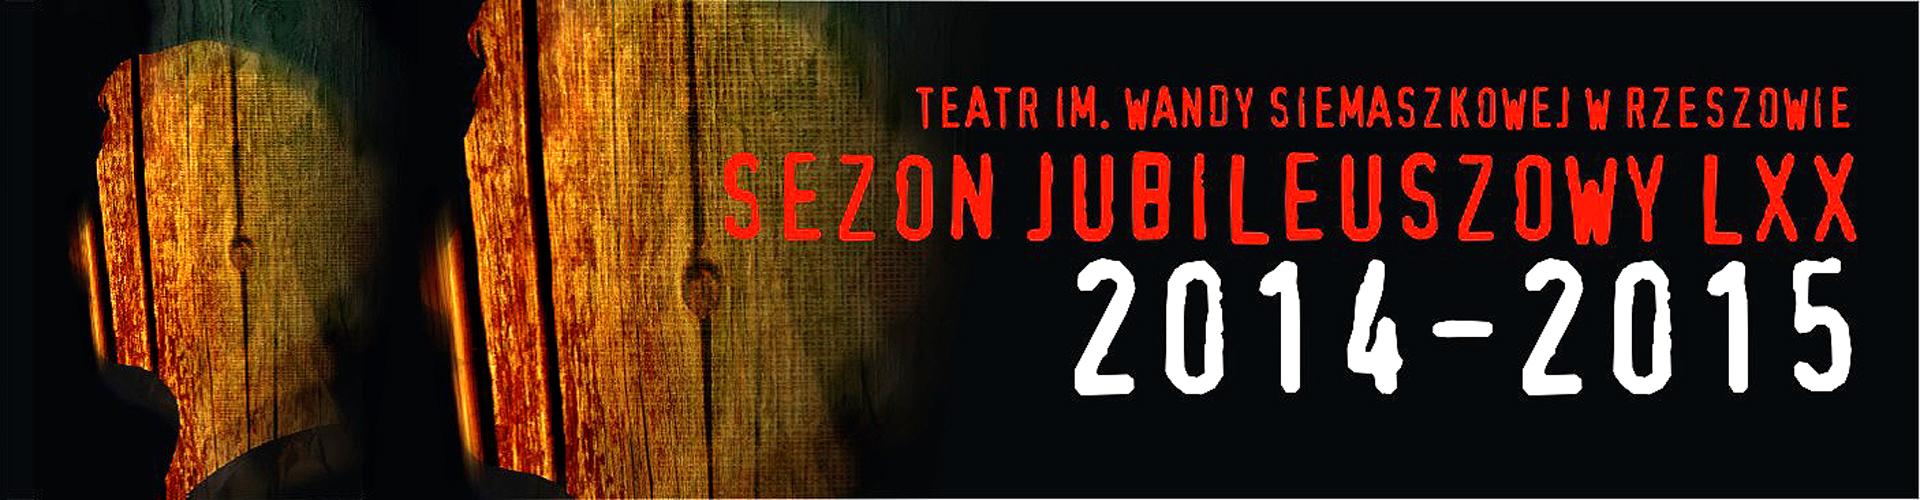 Sezon Jubileuszowy